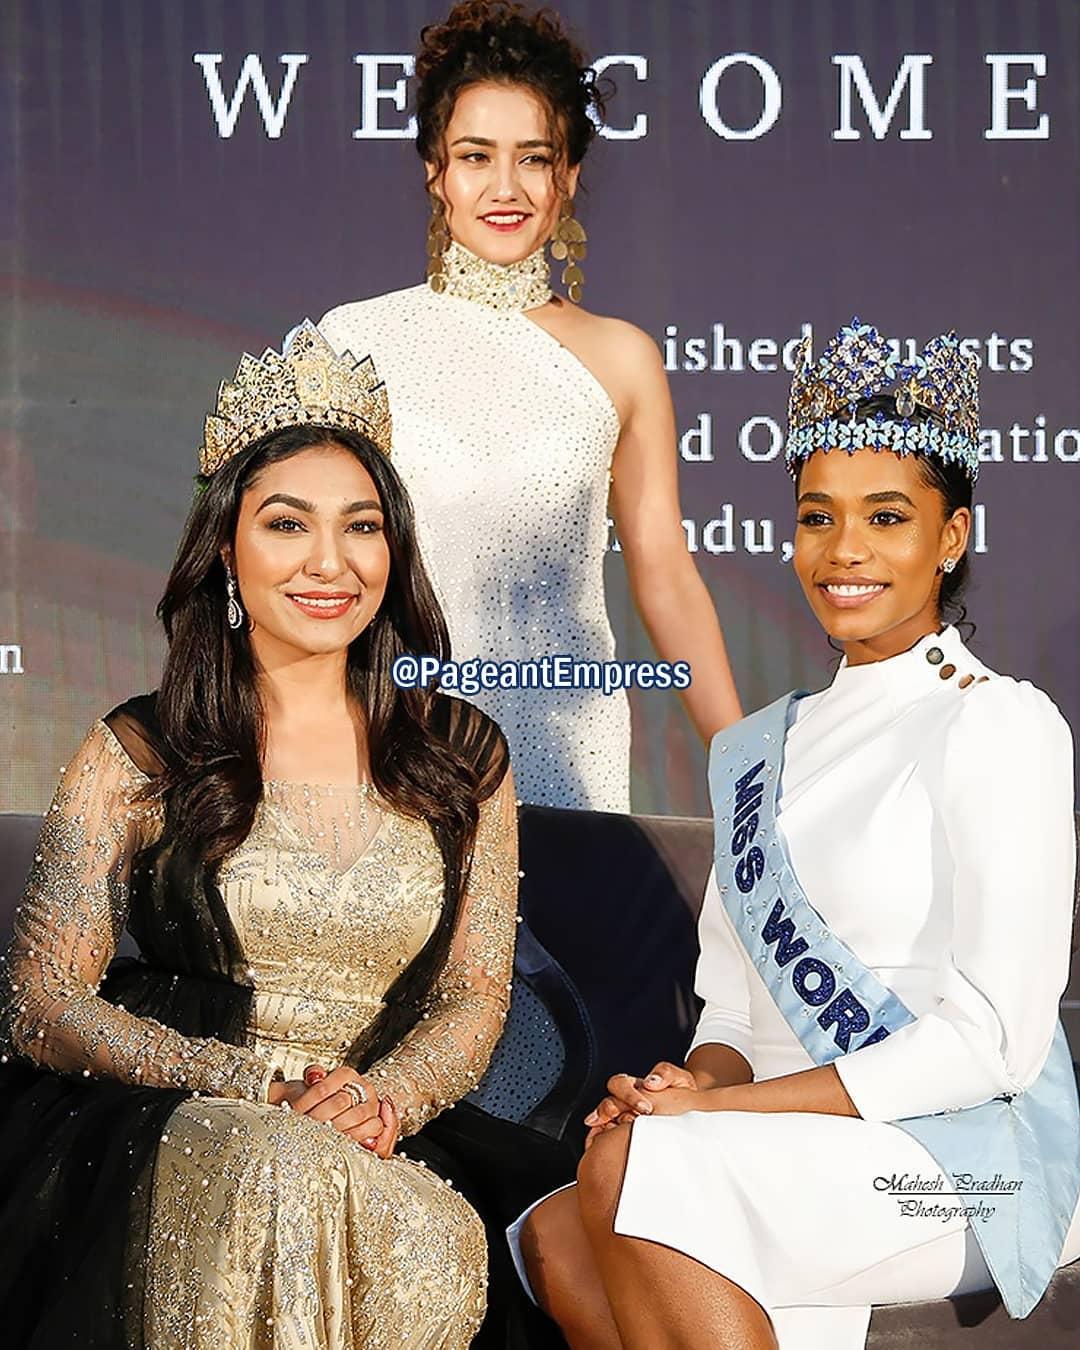 toni-ann singh, miss world 2019. - Página 19 87427810